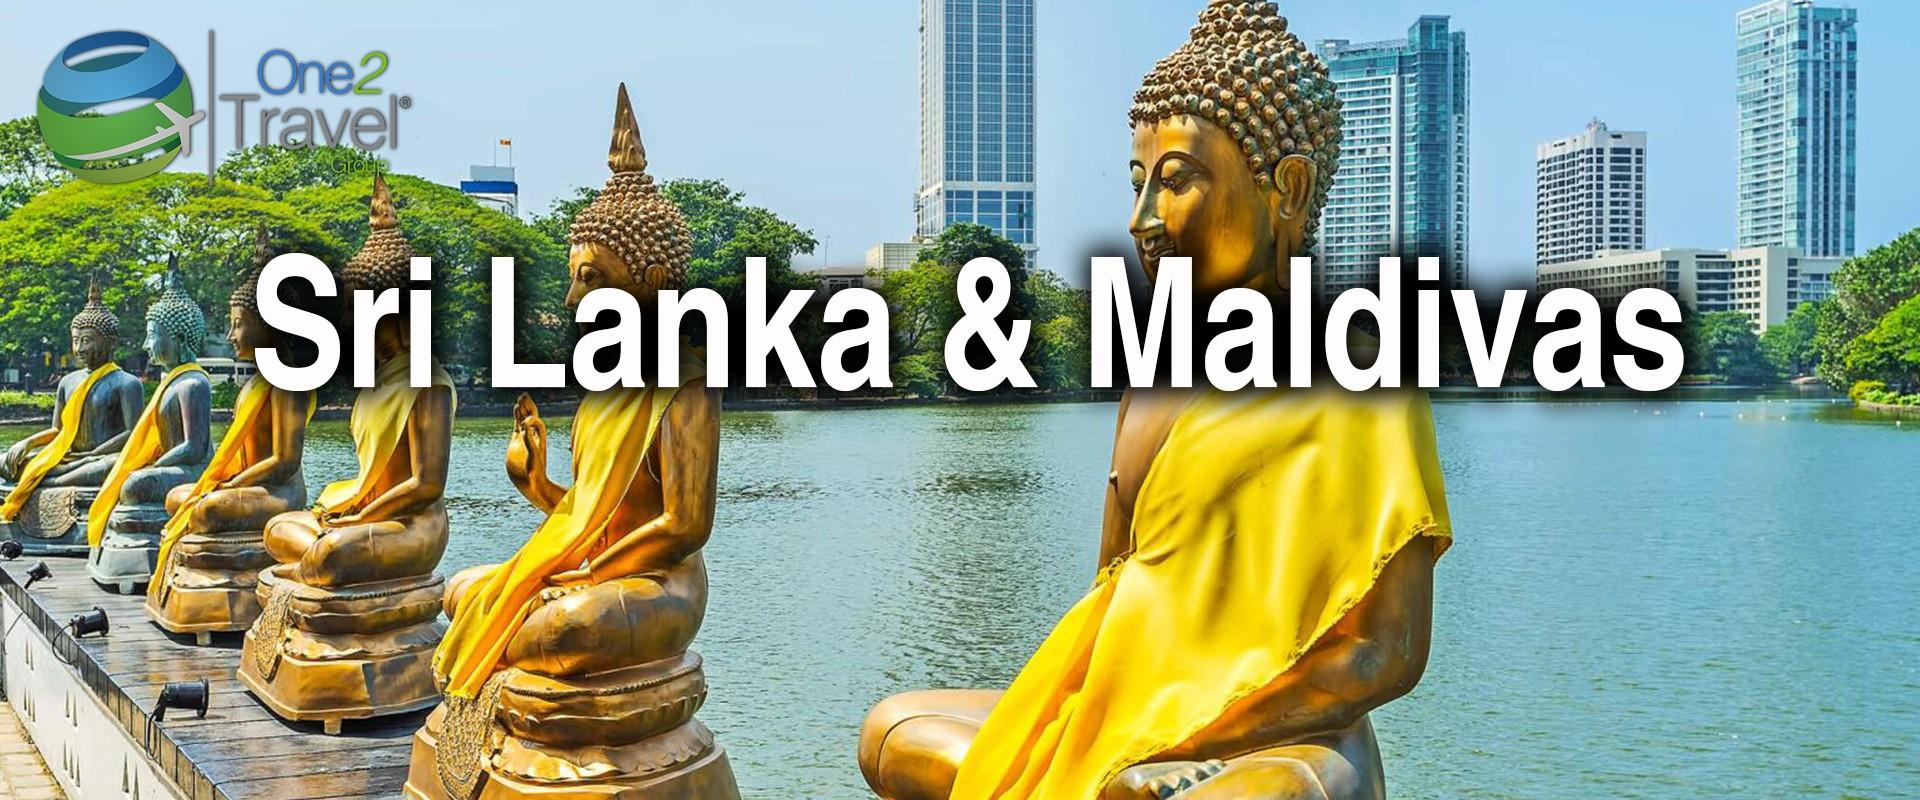 Seminario Web | One2Travel | Sri Lanka & Maldives